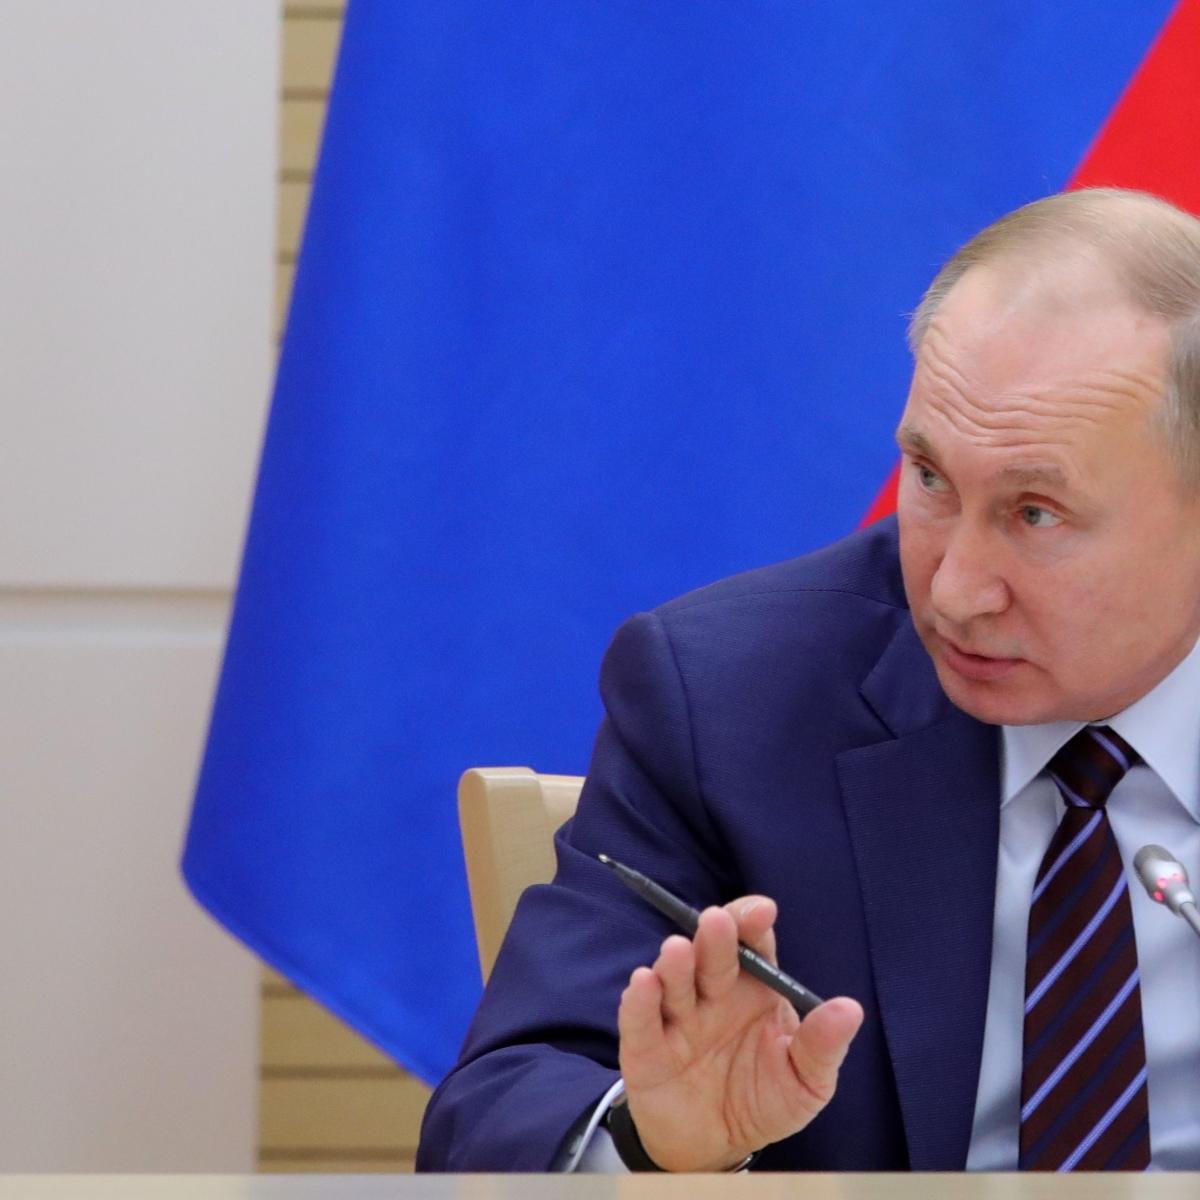 Vladimir Putin to attend Libya peace conference